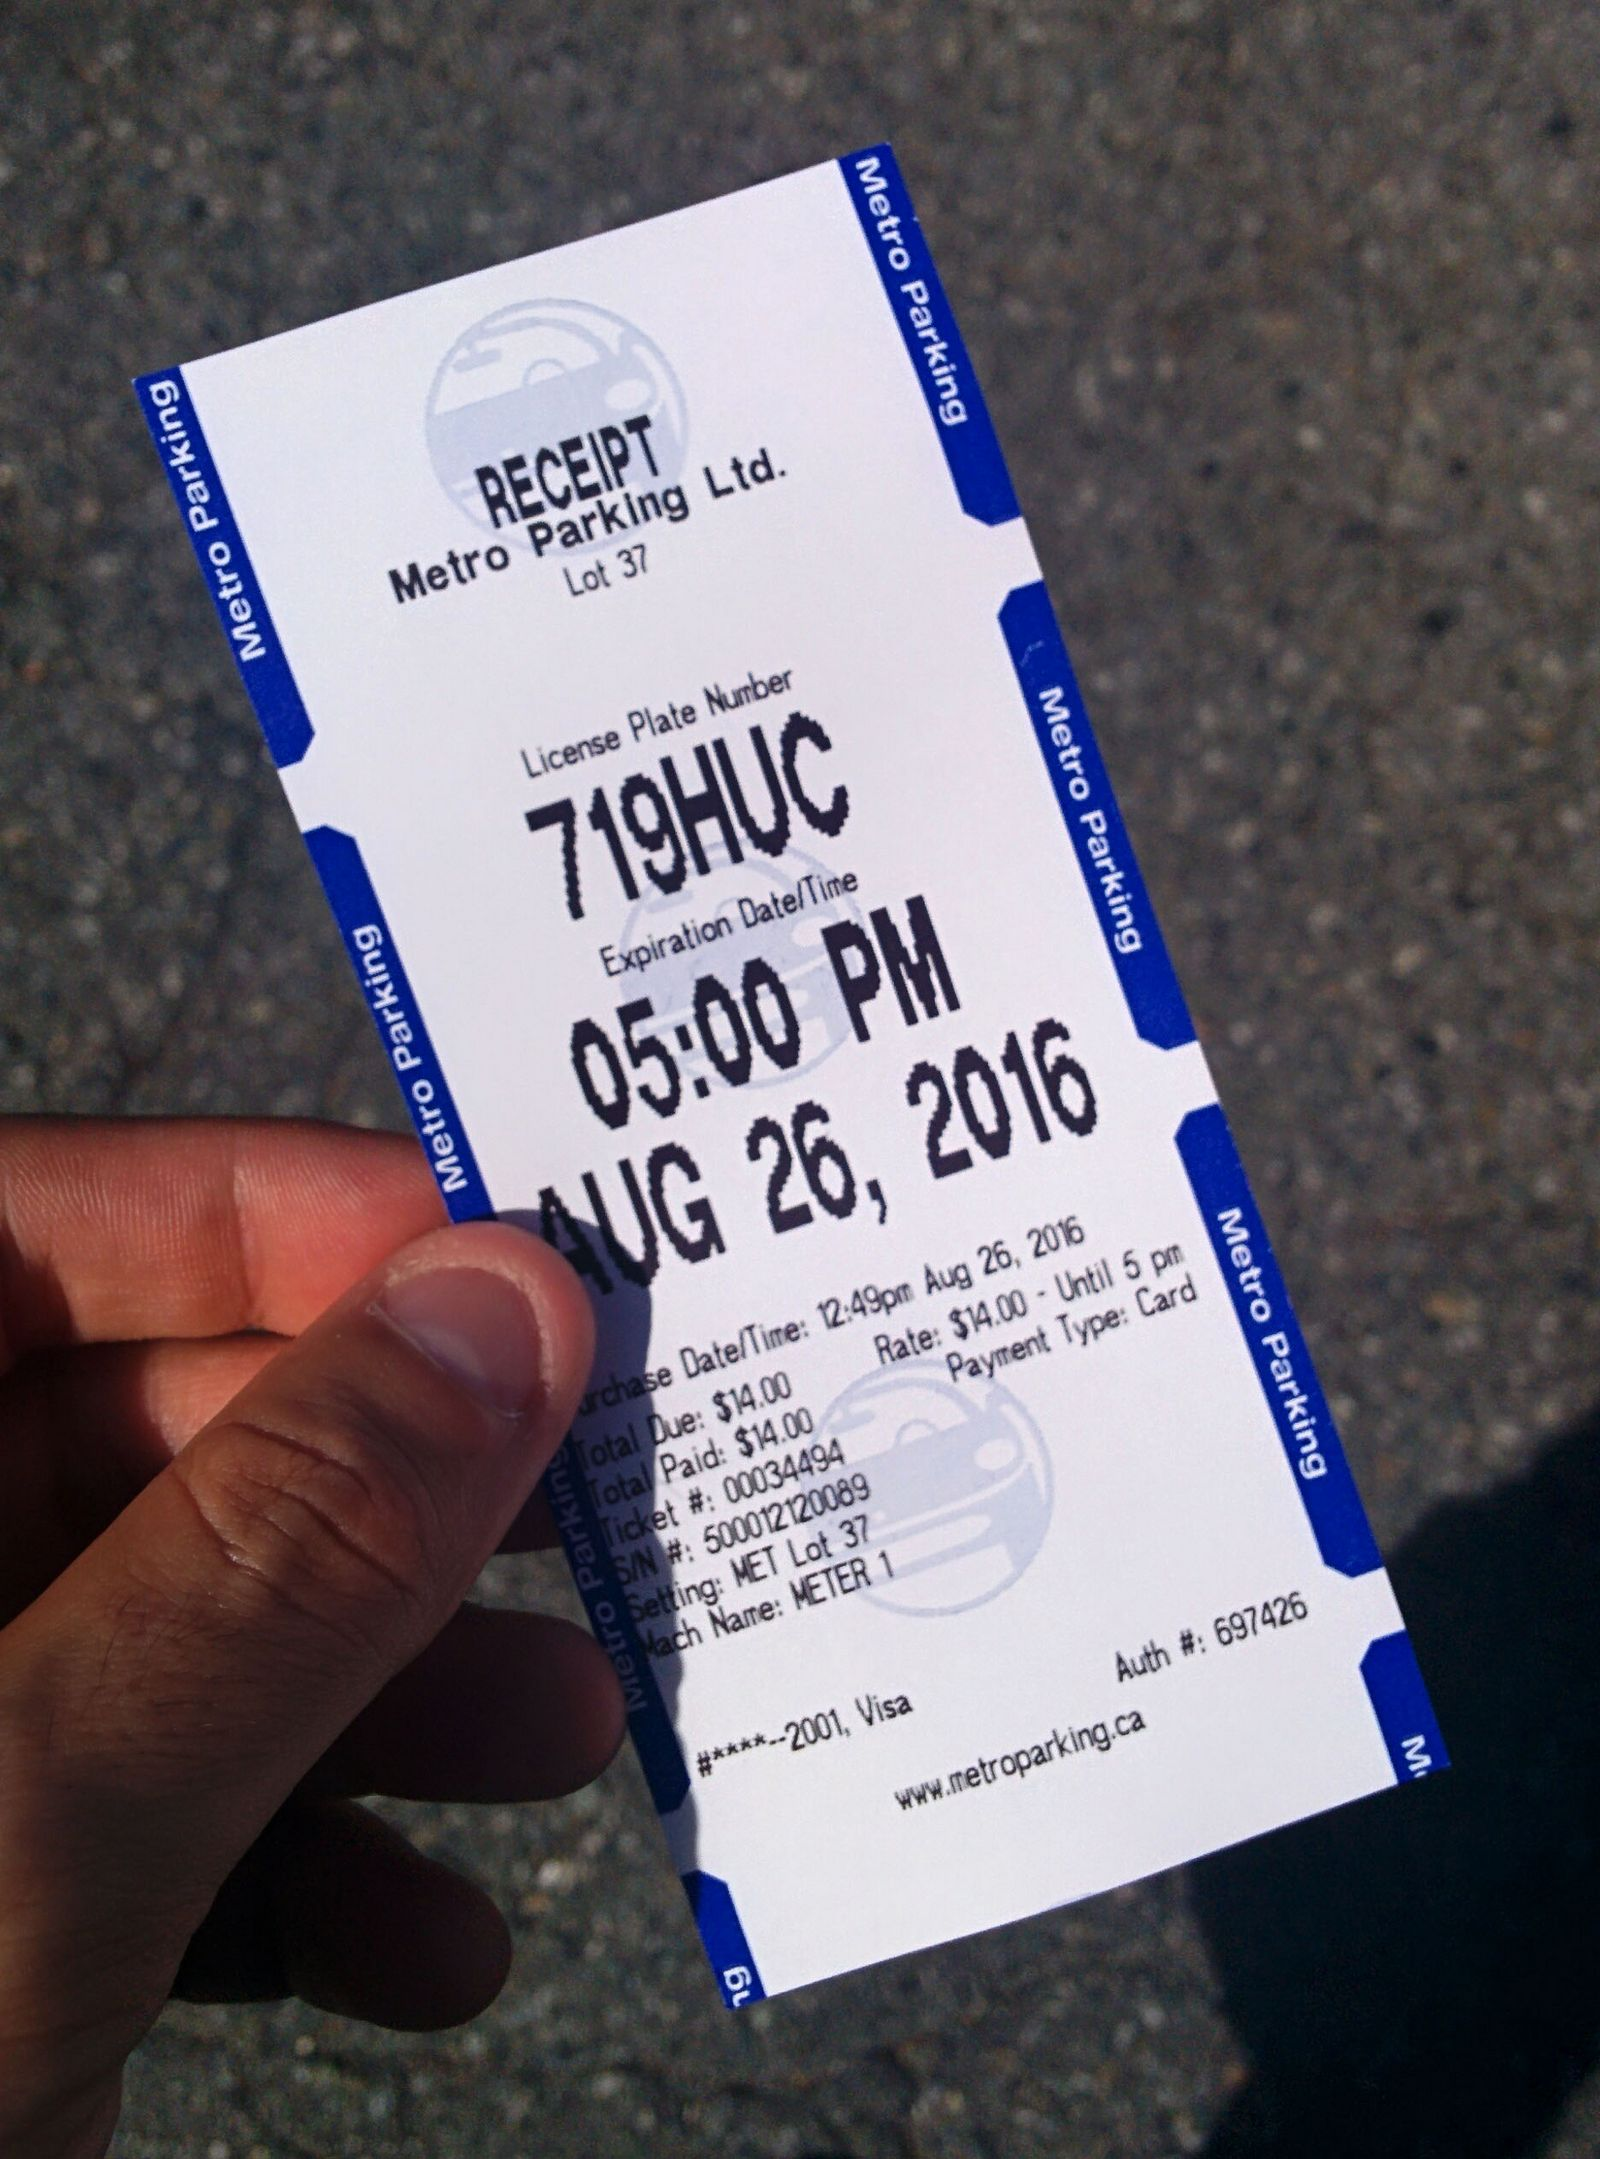 14 dólares para perdernos por Stanley Park